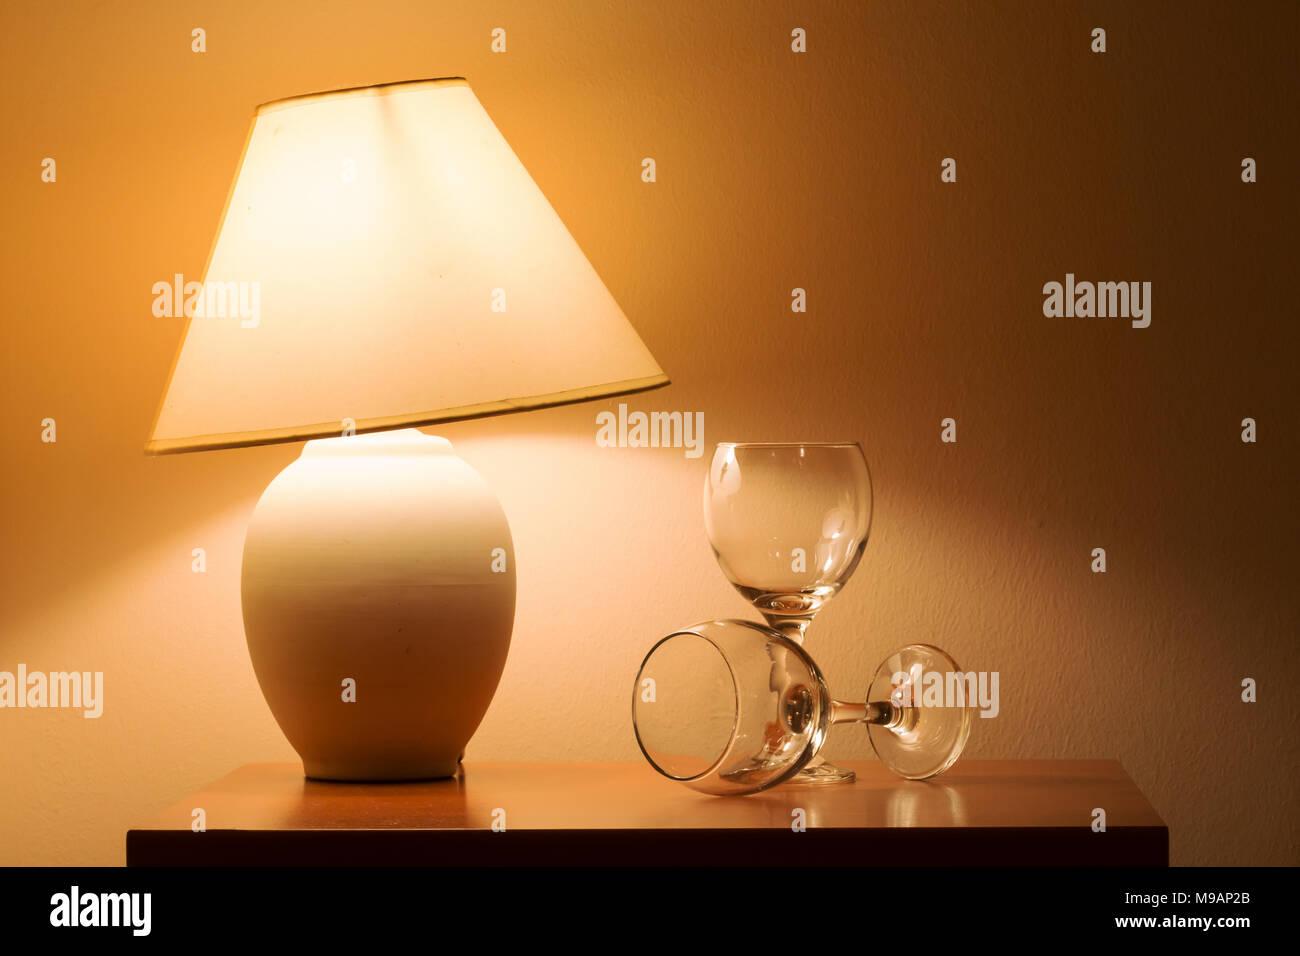 Hotel room light - Stock Image